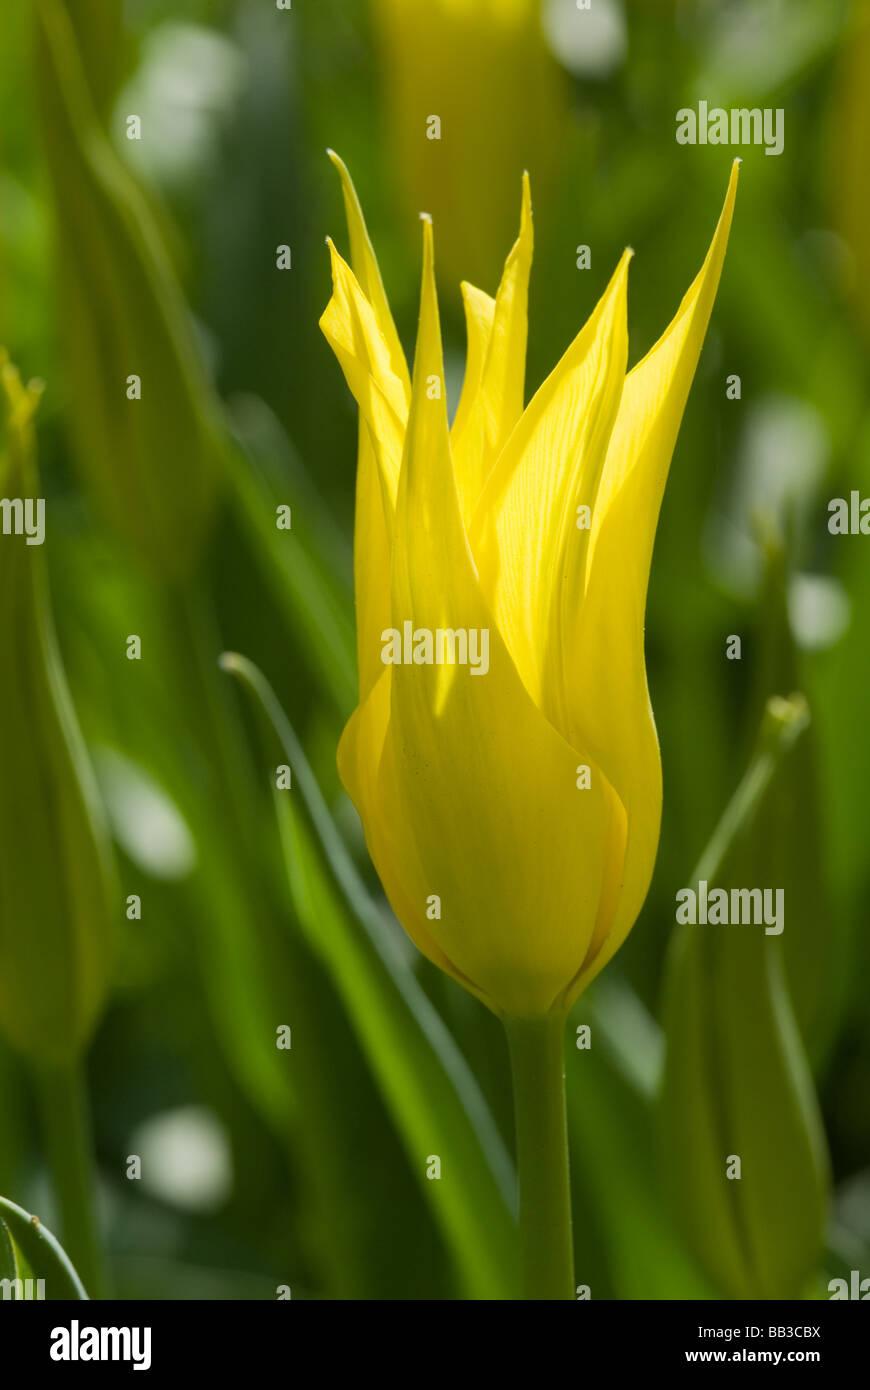 Tulip West Point Immagini & Tulip West Point Fotos Stock - Alamy